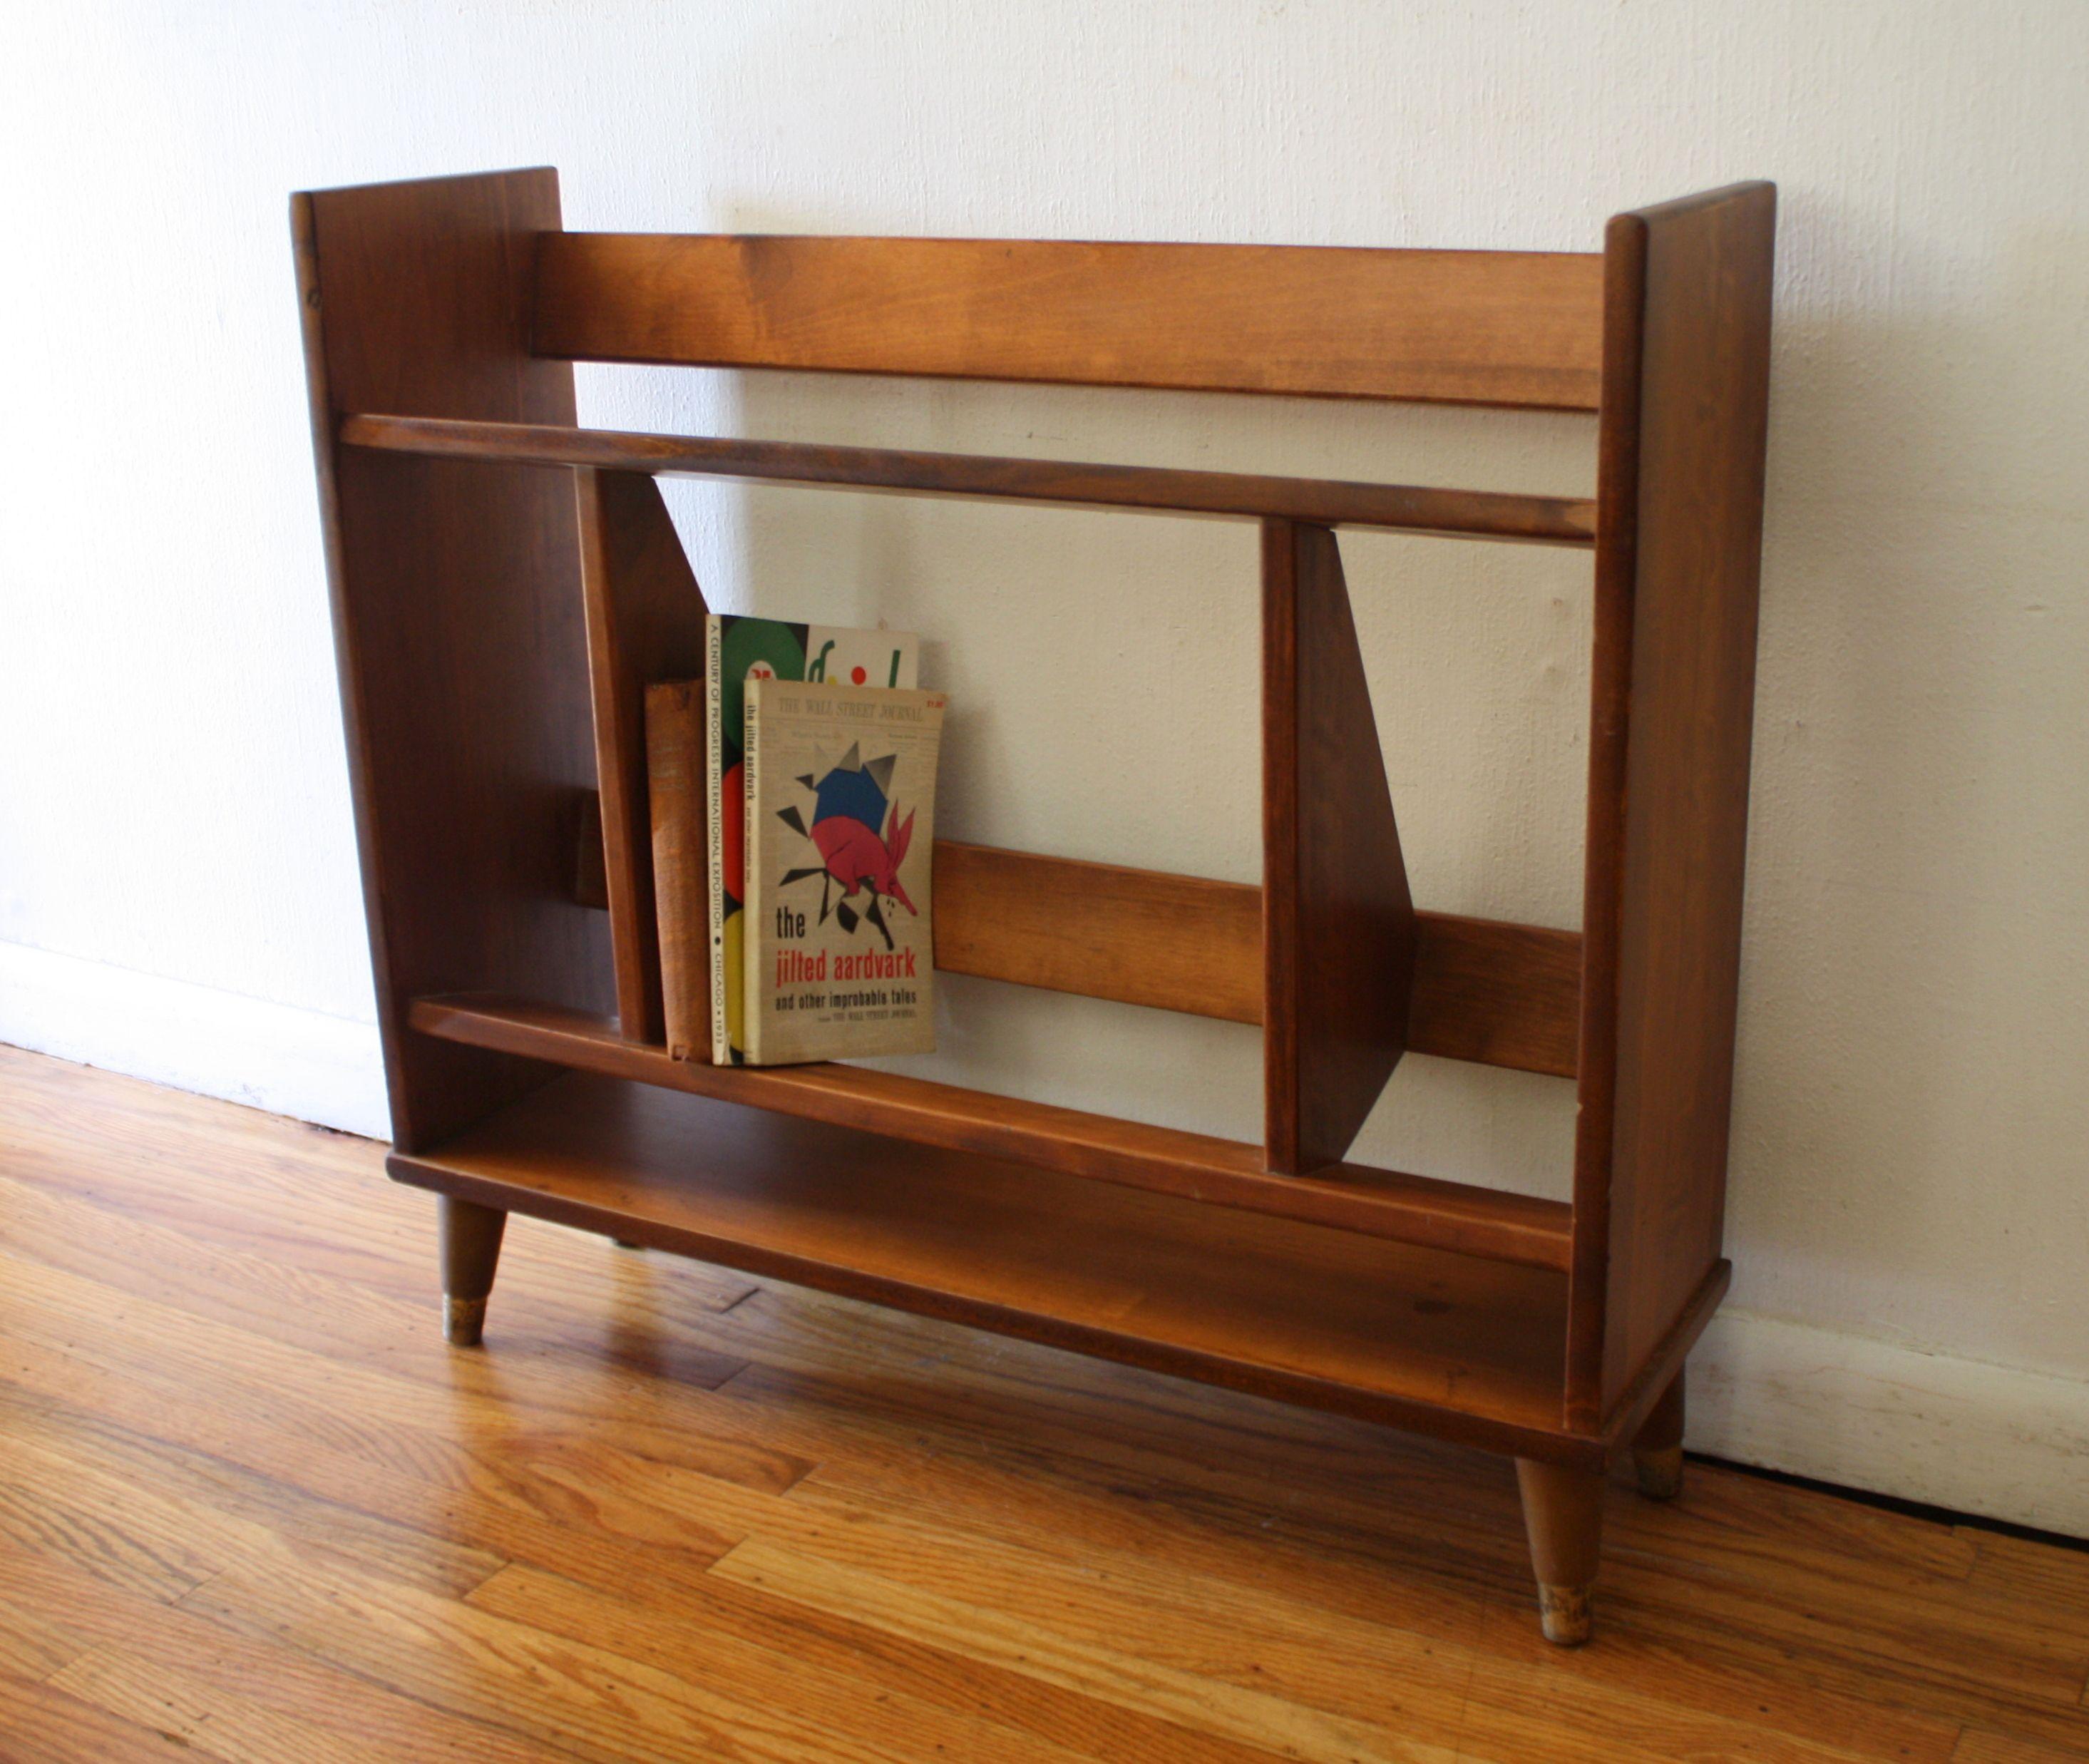 Posts About Bookshelf On Picked Vintage